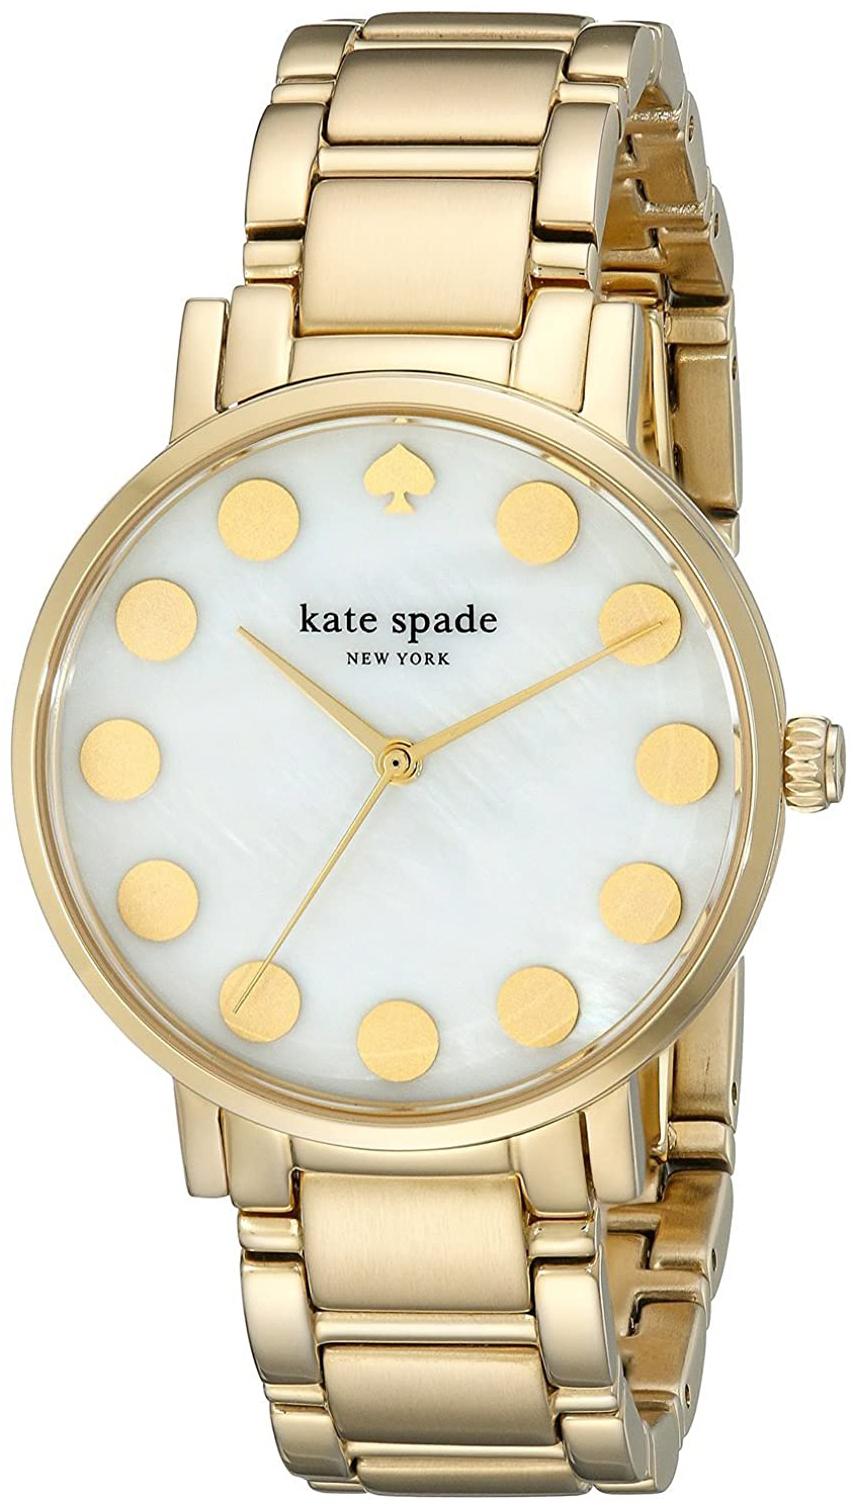 Kate Spade Gramercy Dameklokke 1YRU0737 Hvit/Gulltonet stål Ø34 mm - Kate Spade